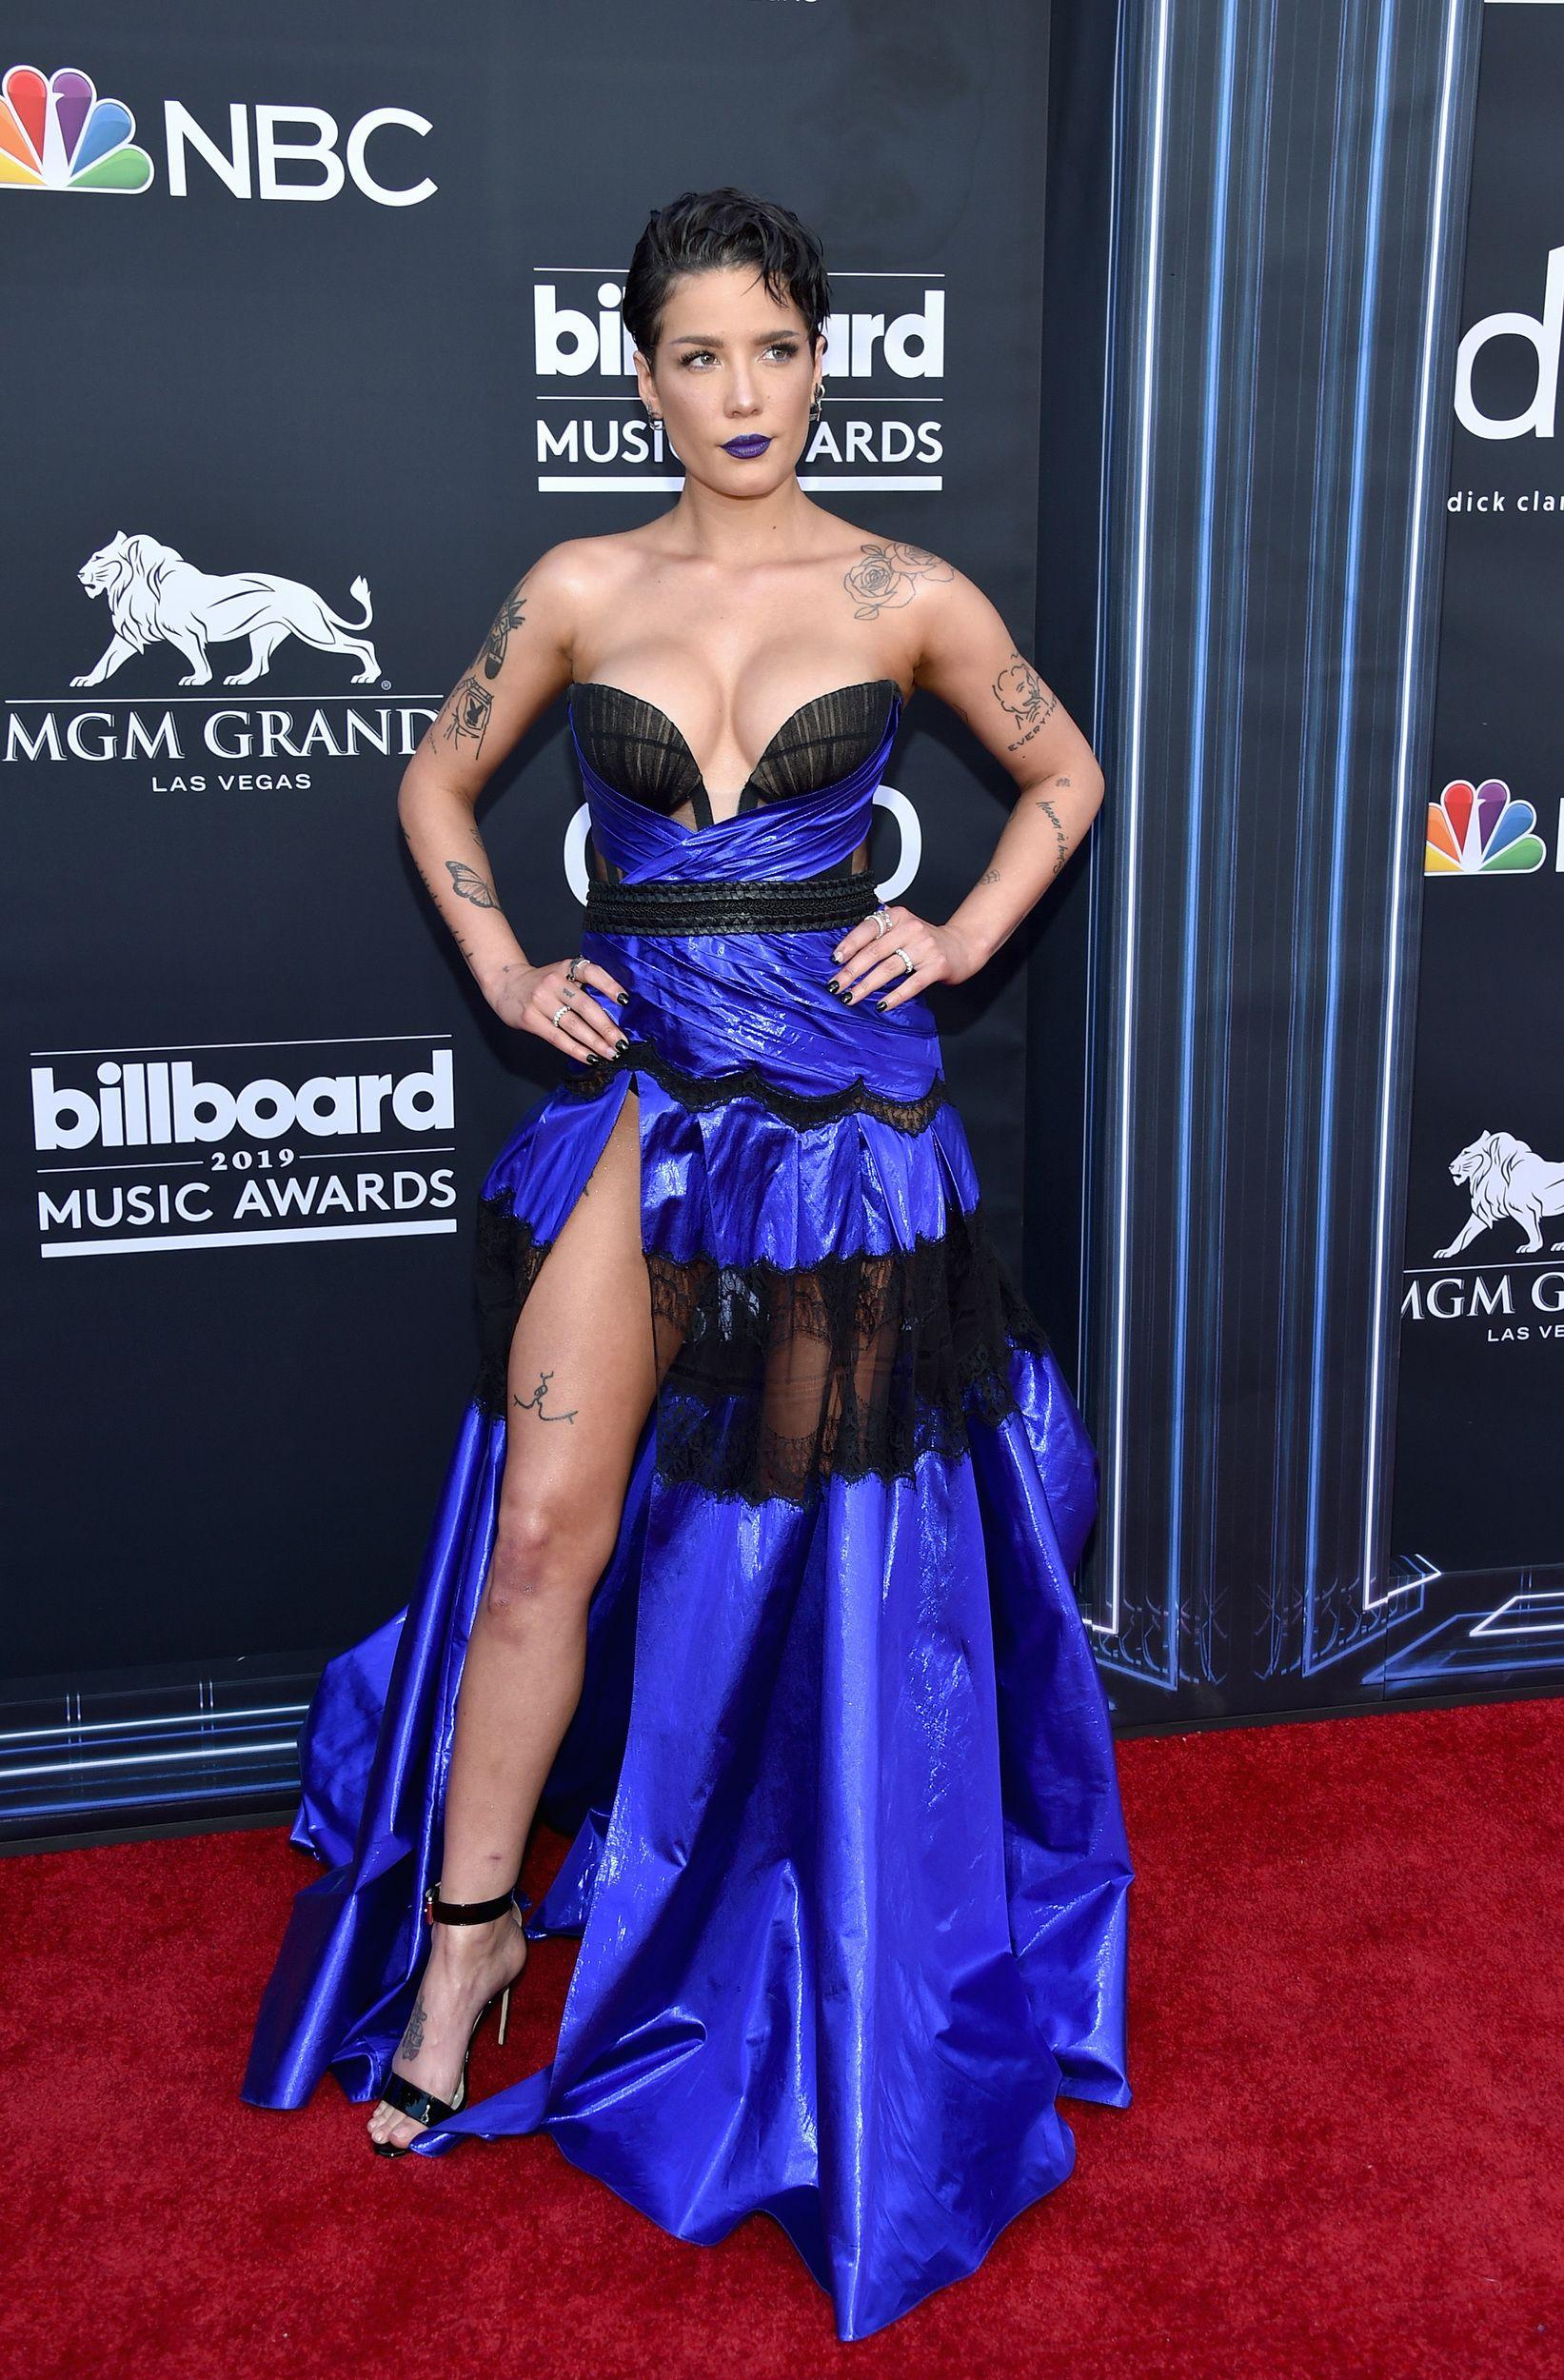 Billboards 2019 Best dressed of the night Nice dresses